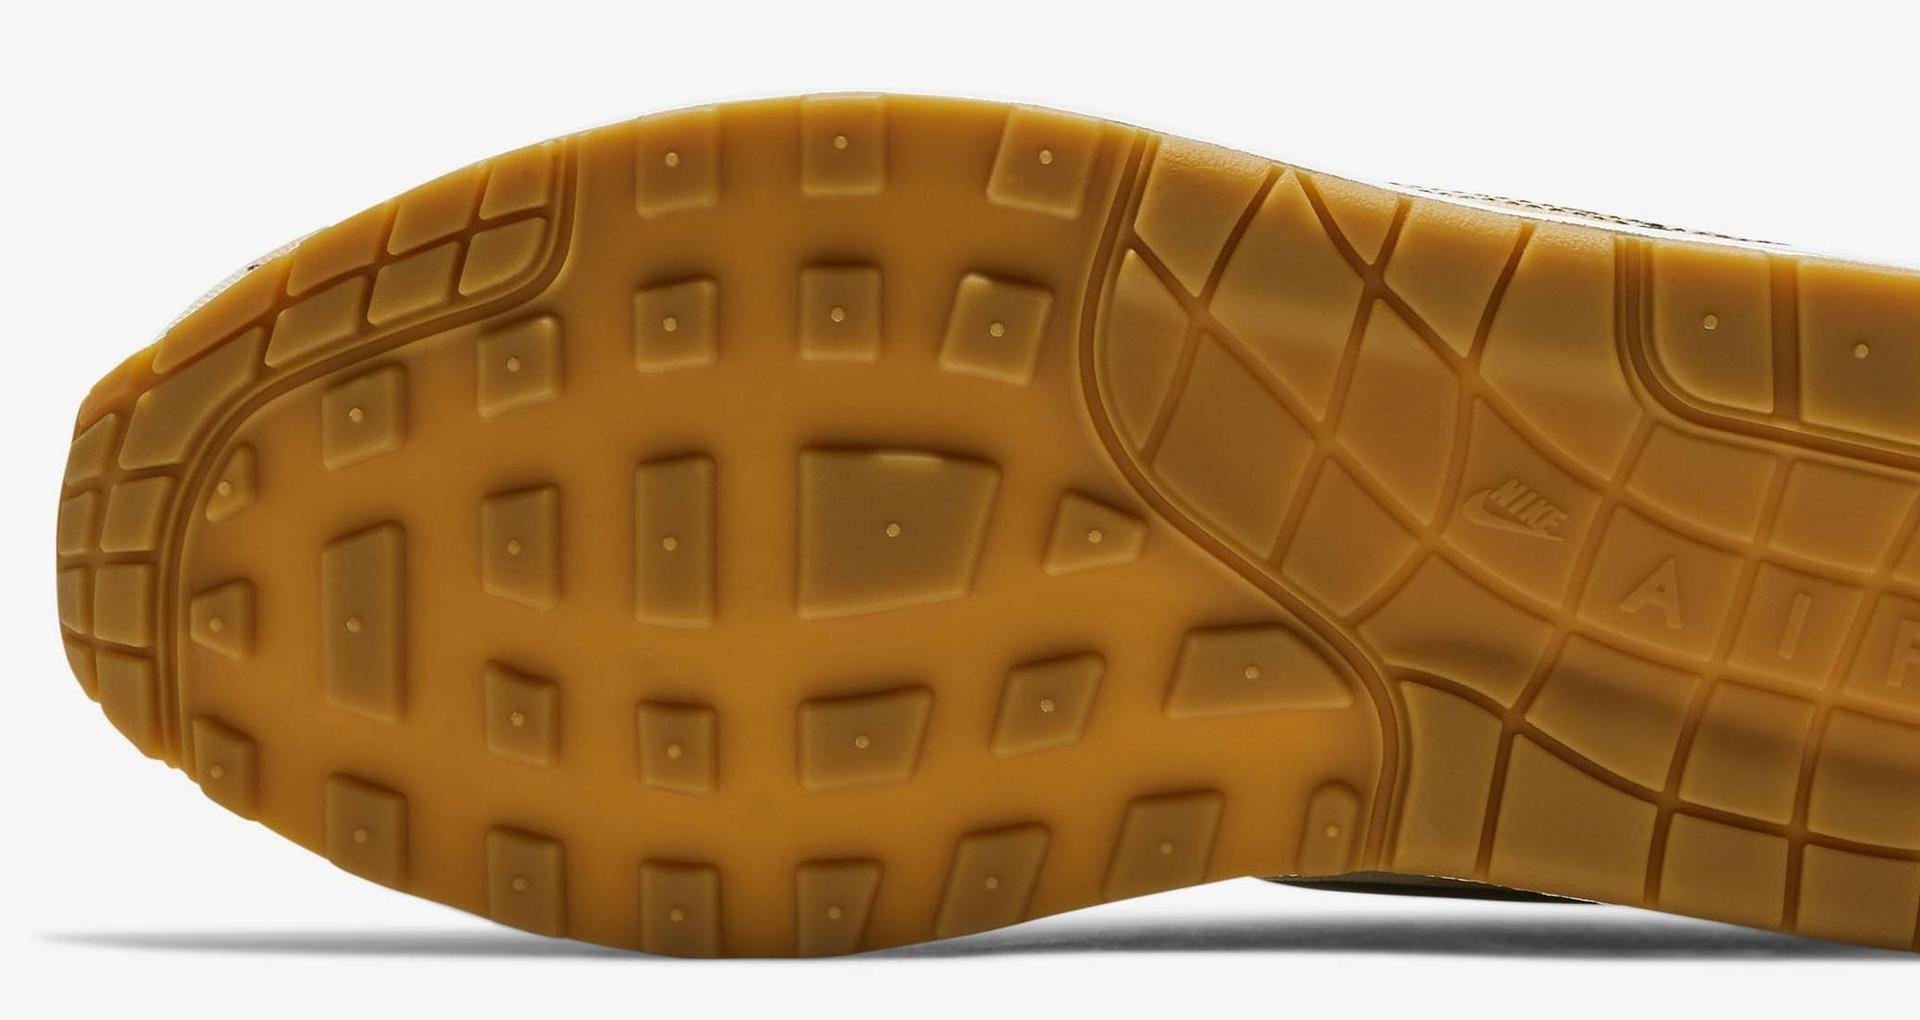 Nike Air Max 1 Premium 'Desert Camo' Release Date. Nike SNKRS